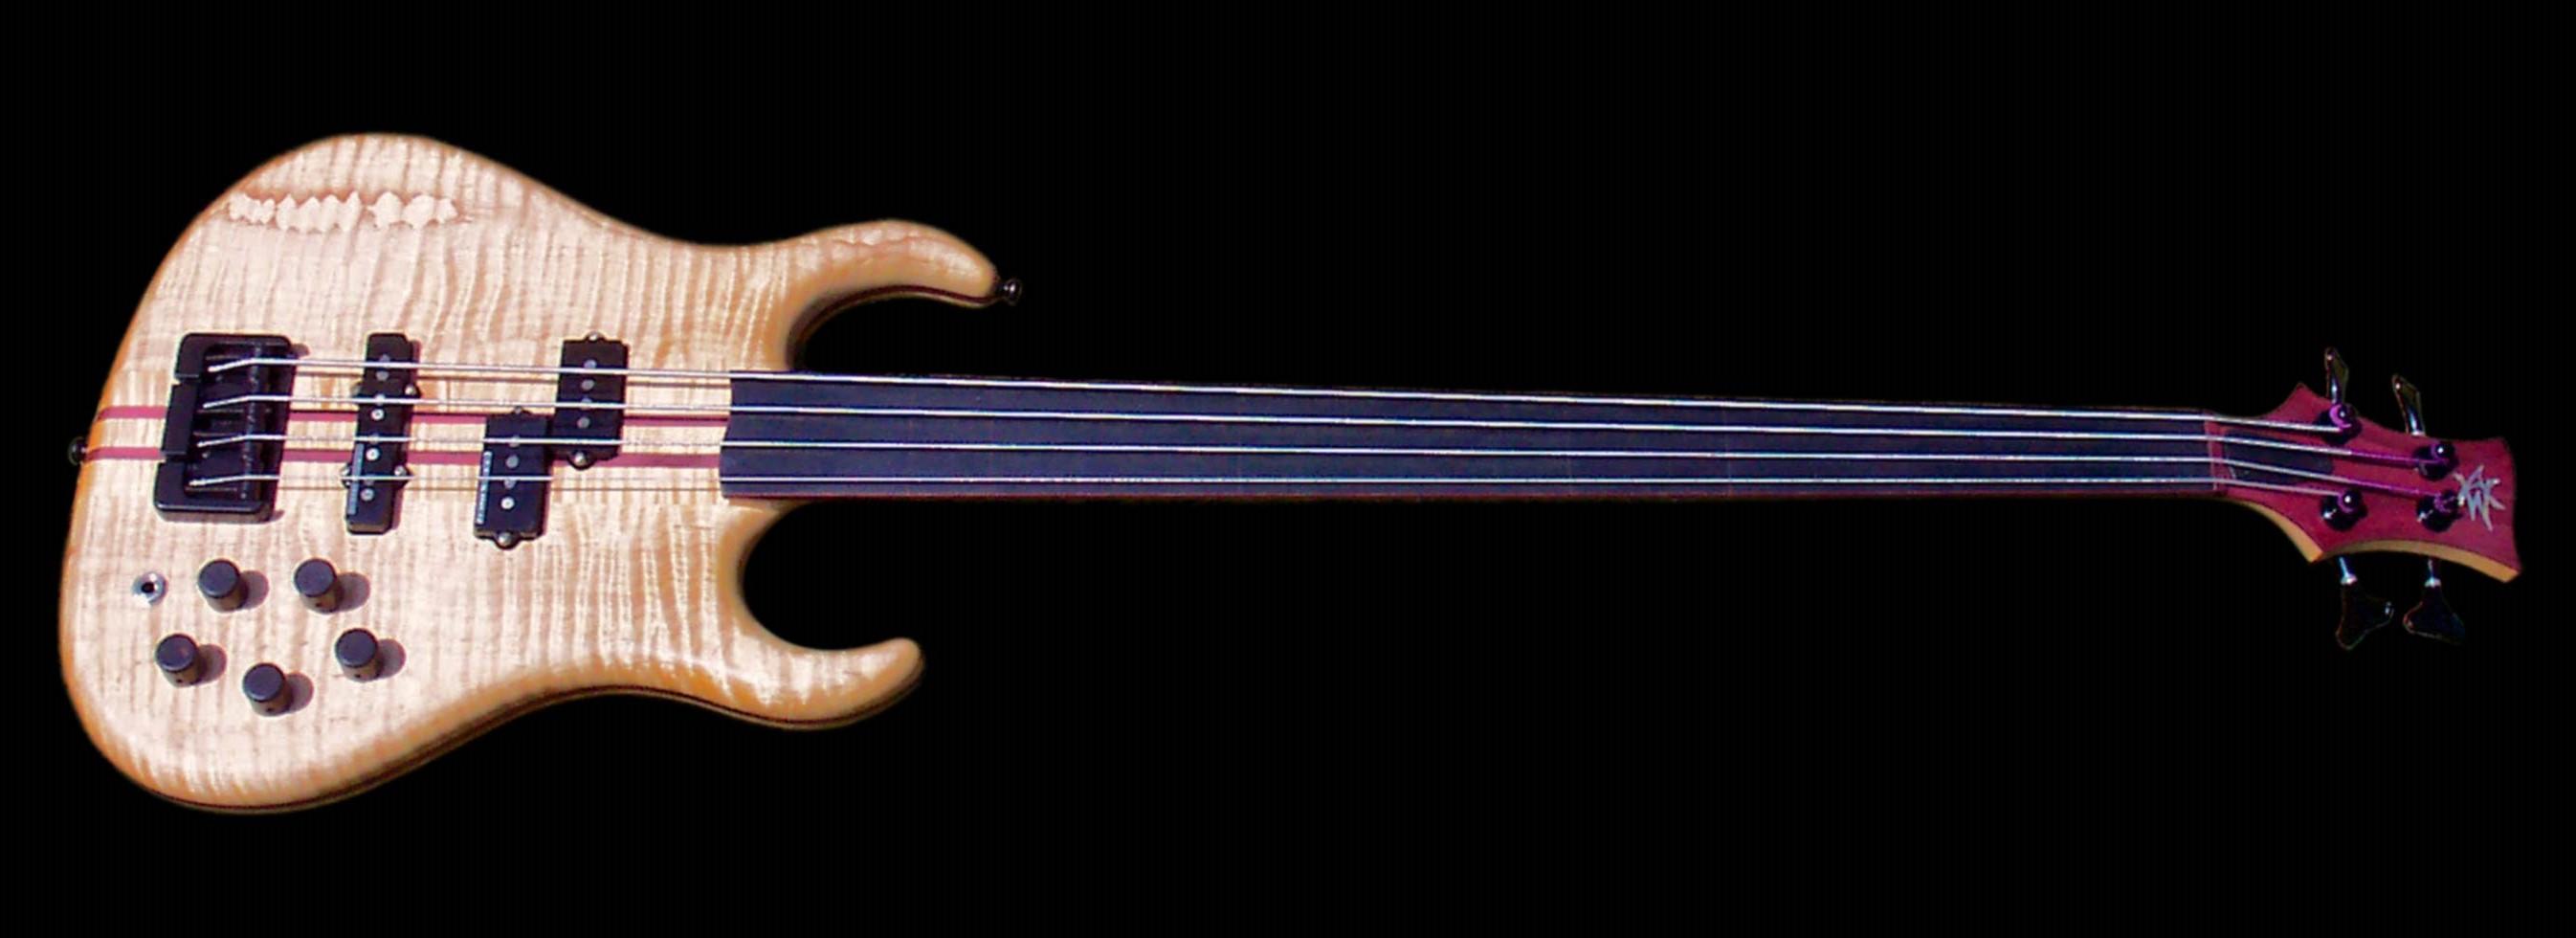 Bass-1w